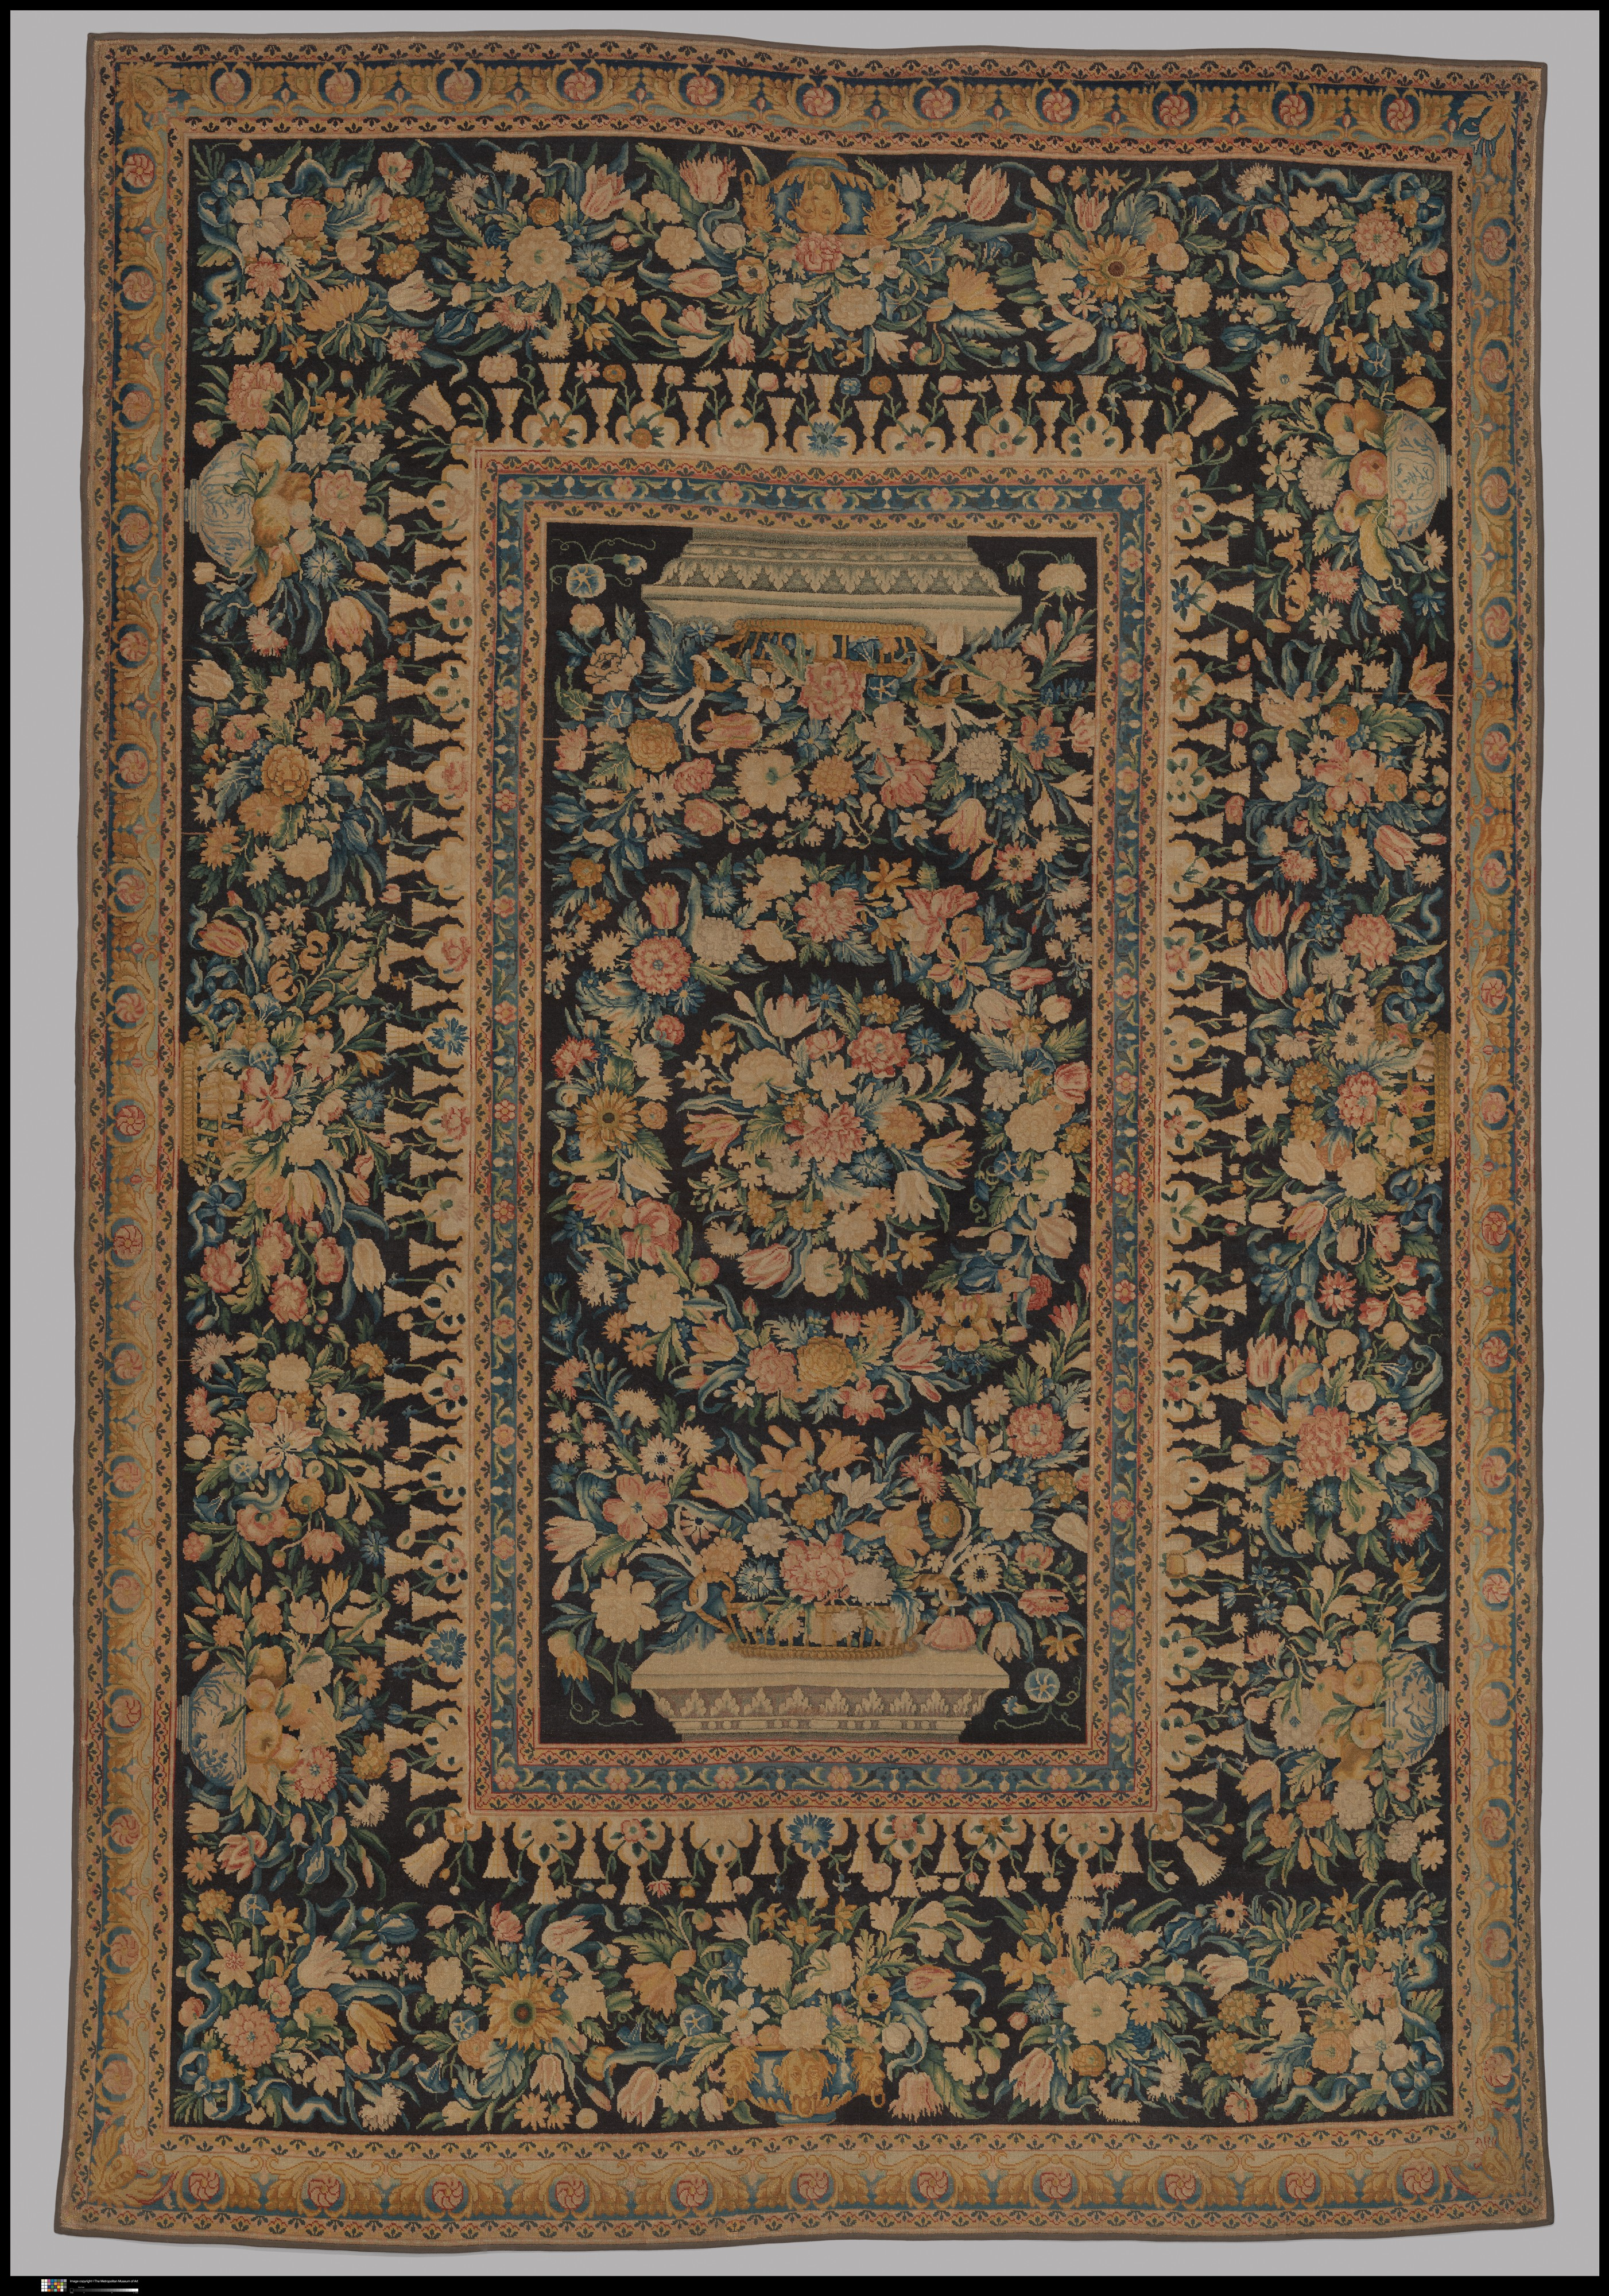 Savonnerie Manufactory Carpet Tapis French Paris The Met